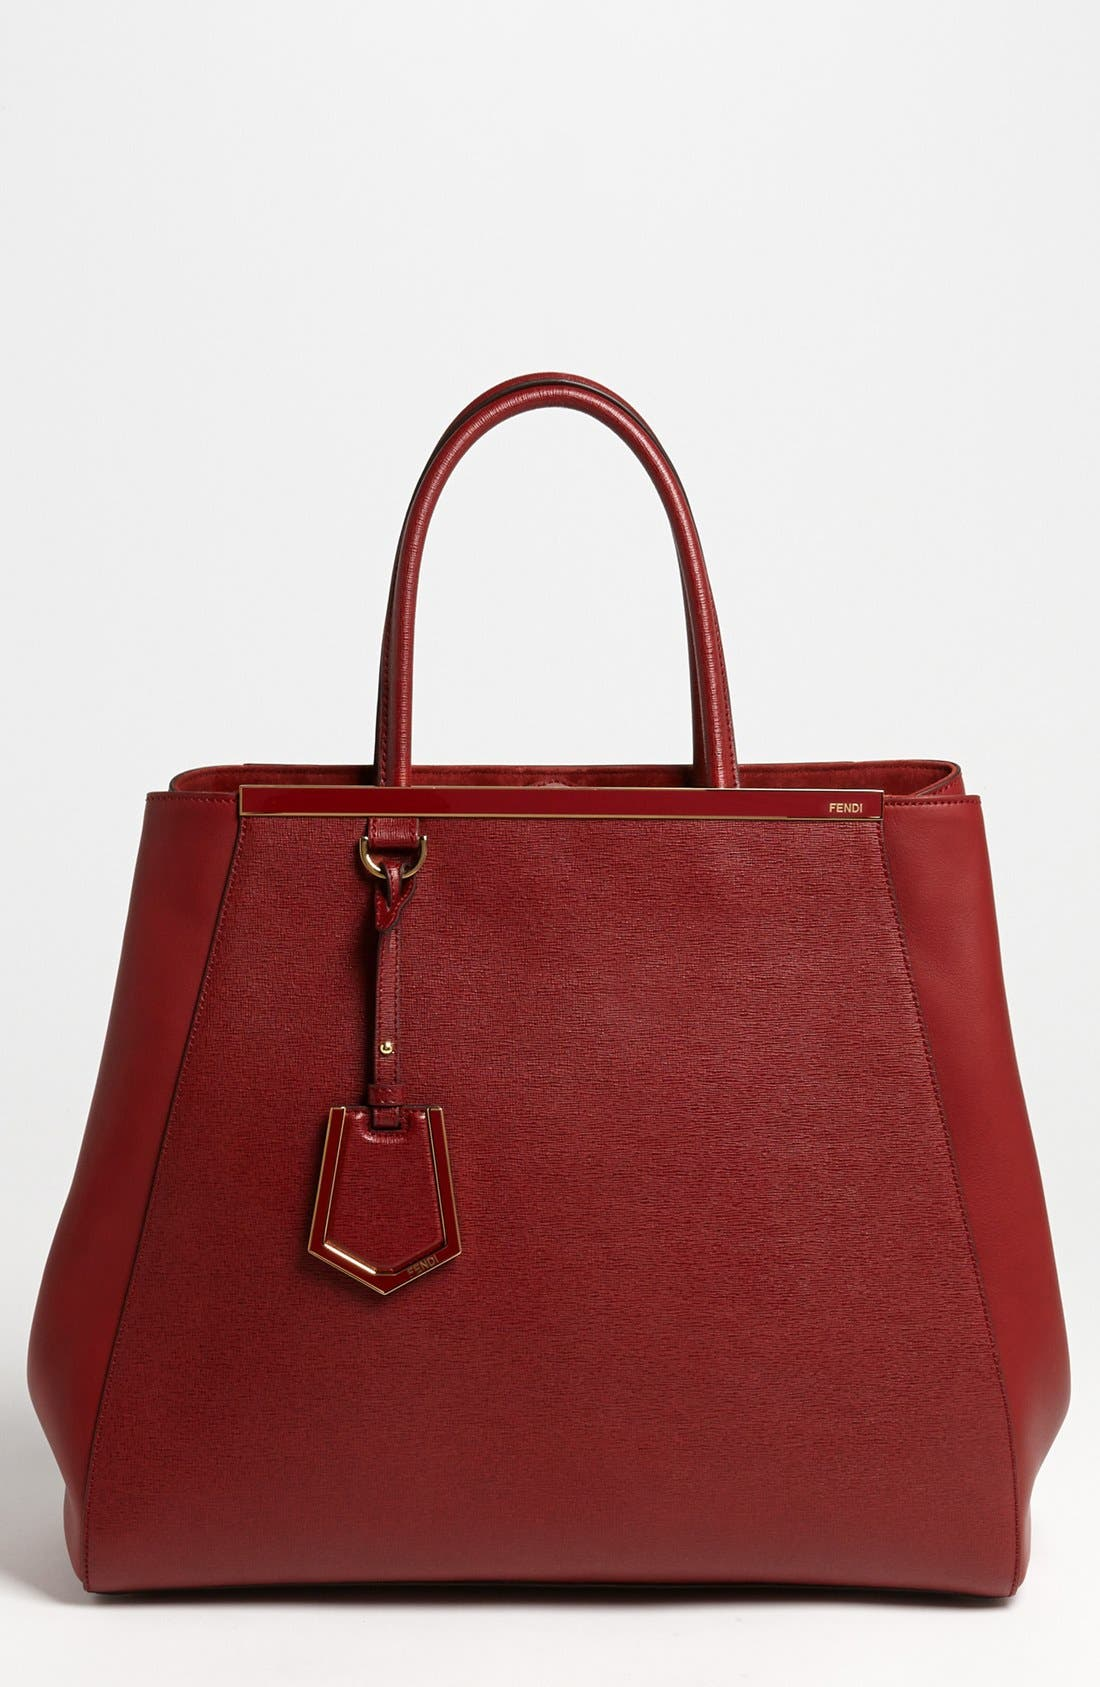 Alternate Image 1 Selected - Fendi '2Jours Elite - Large' Leather Shopper